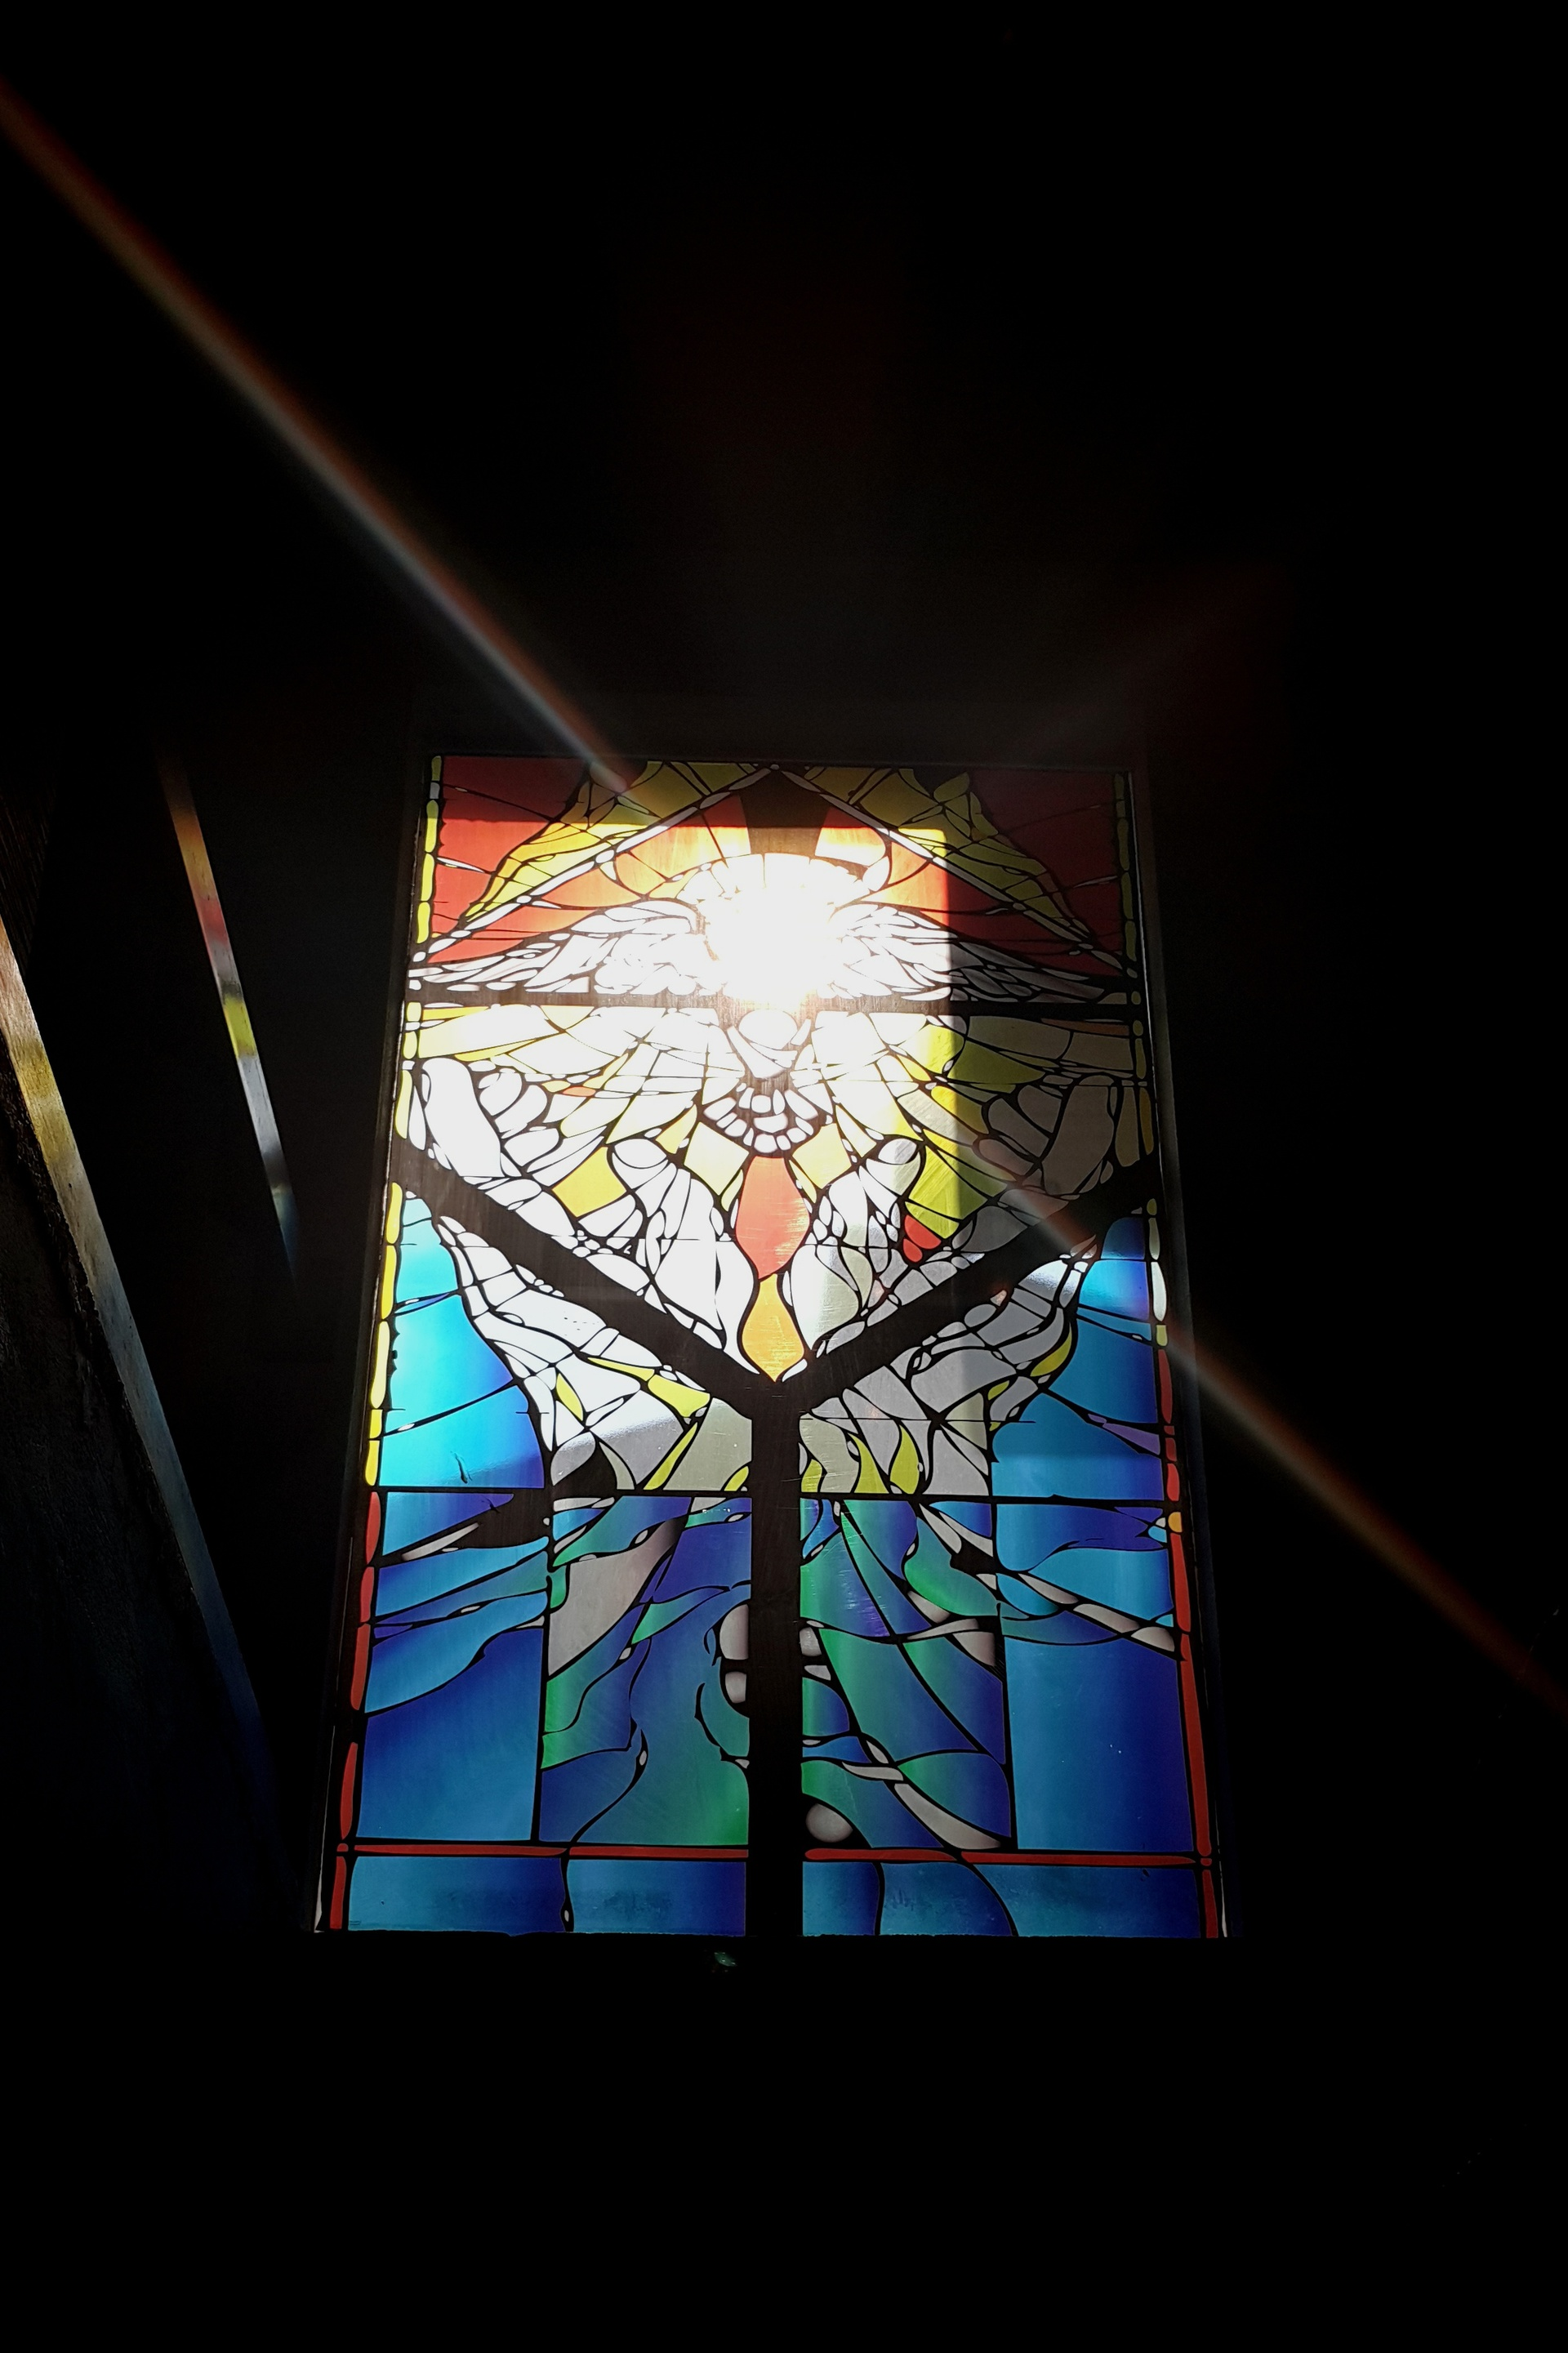 window | fongphy, light, sun, sunset